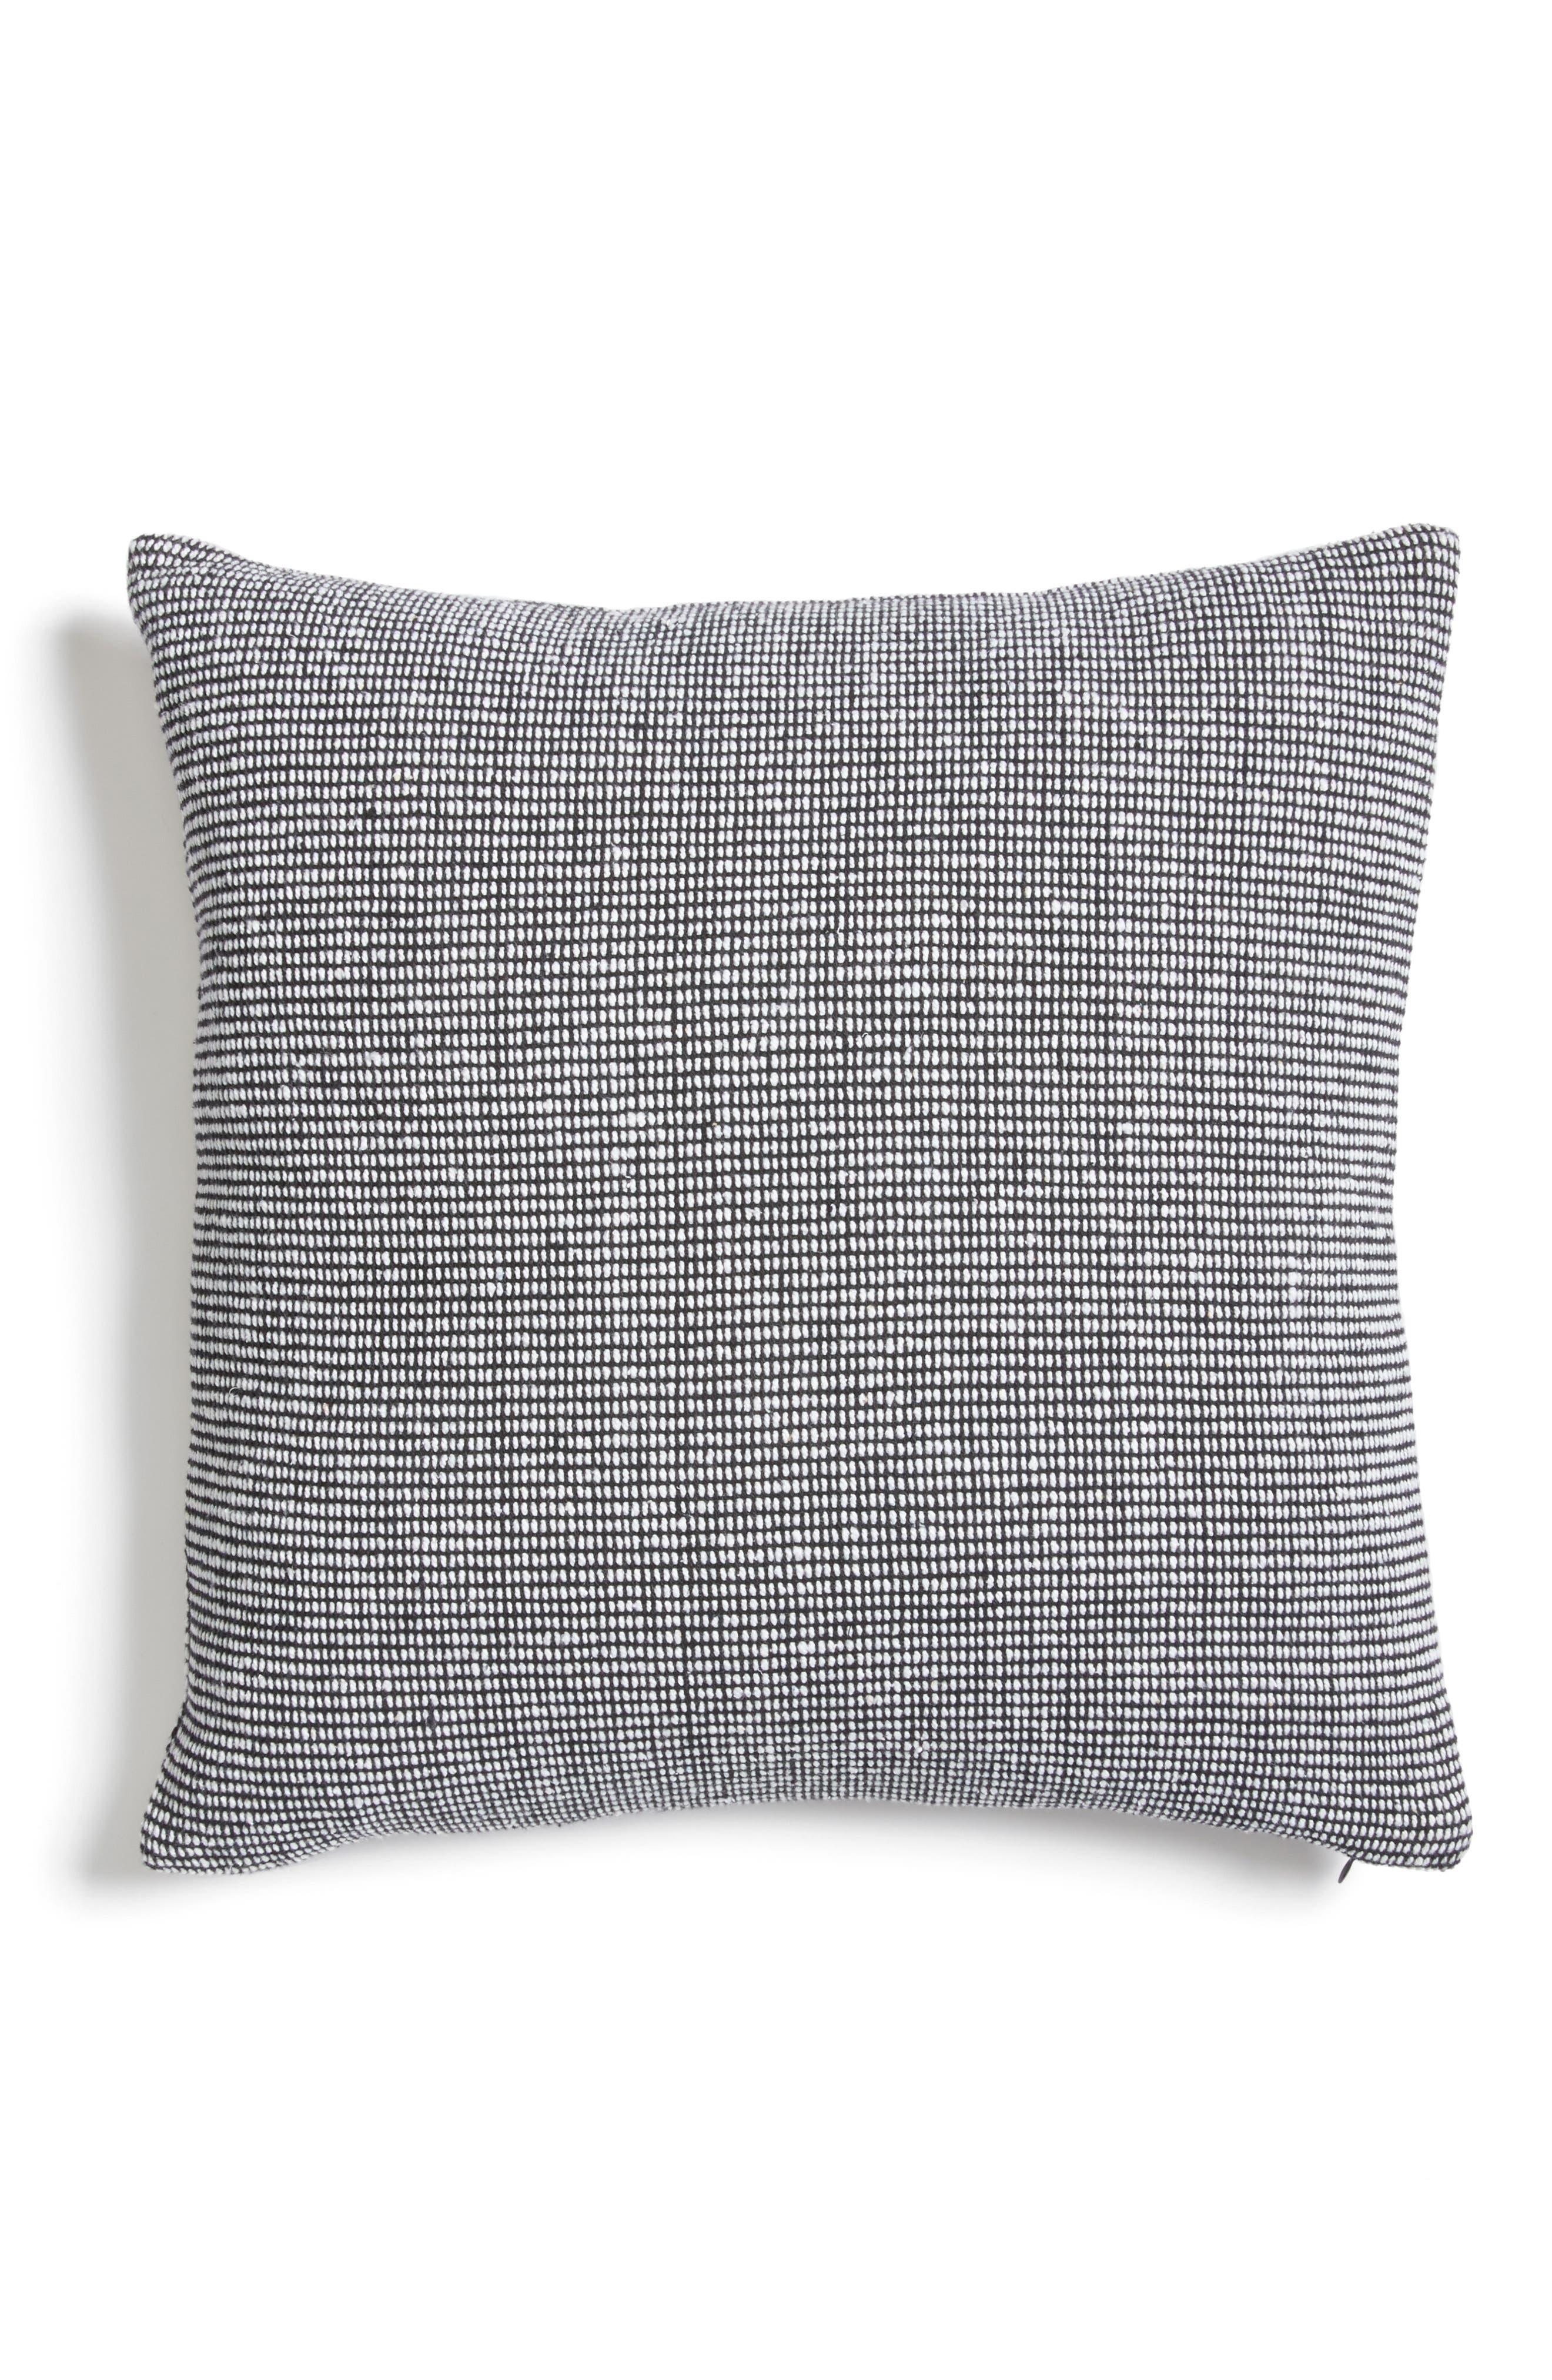 CALVIN KLEIN HOME,                             Structure Accent Pillow,                             Alternate thumbnail 2, color,                             001